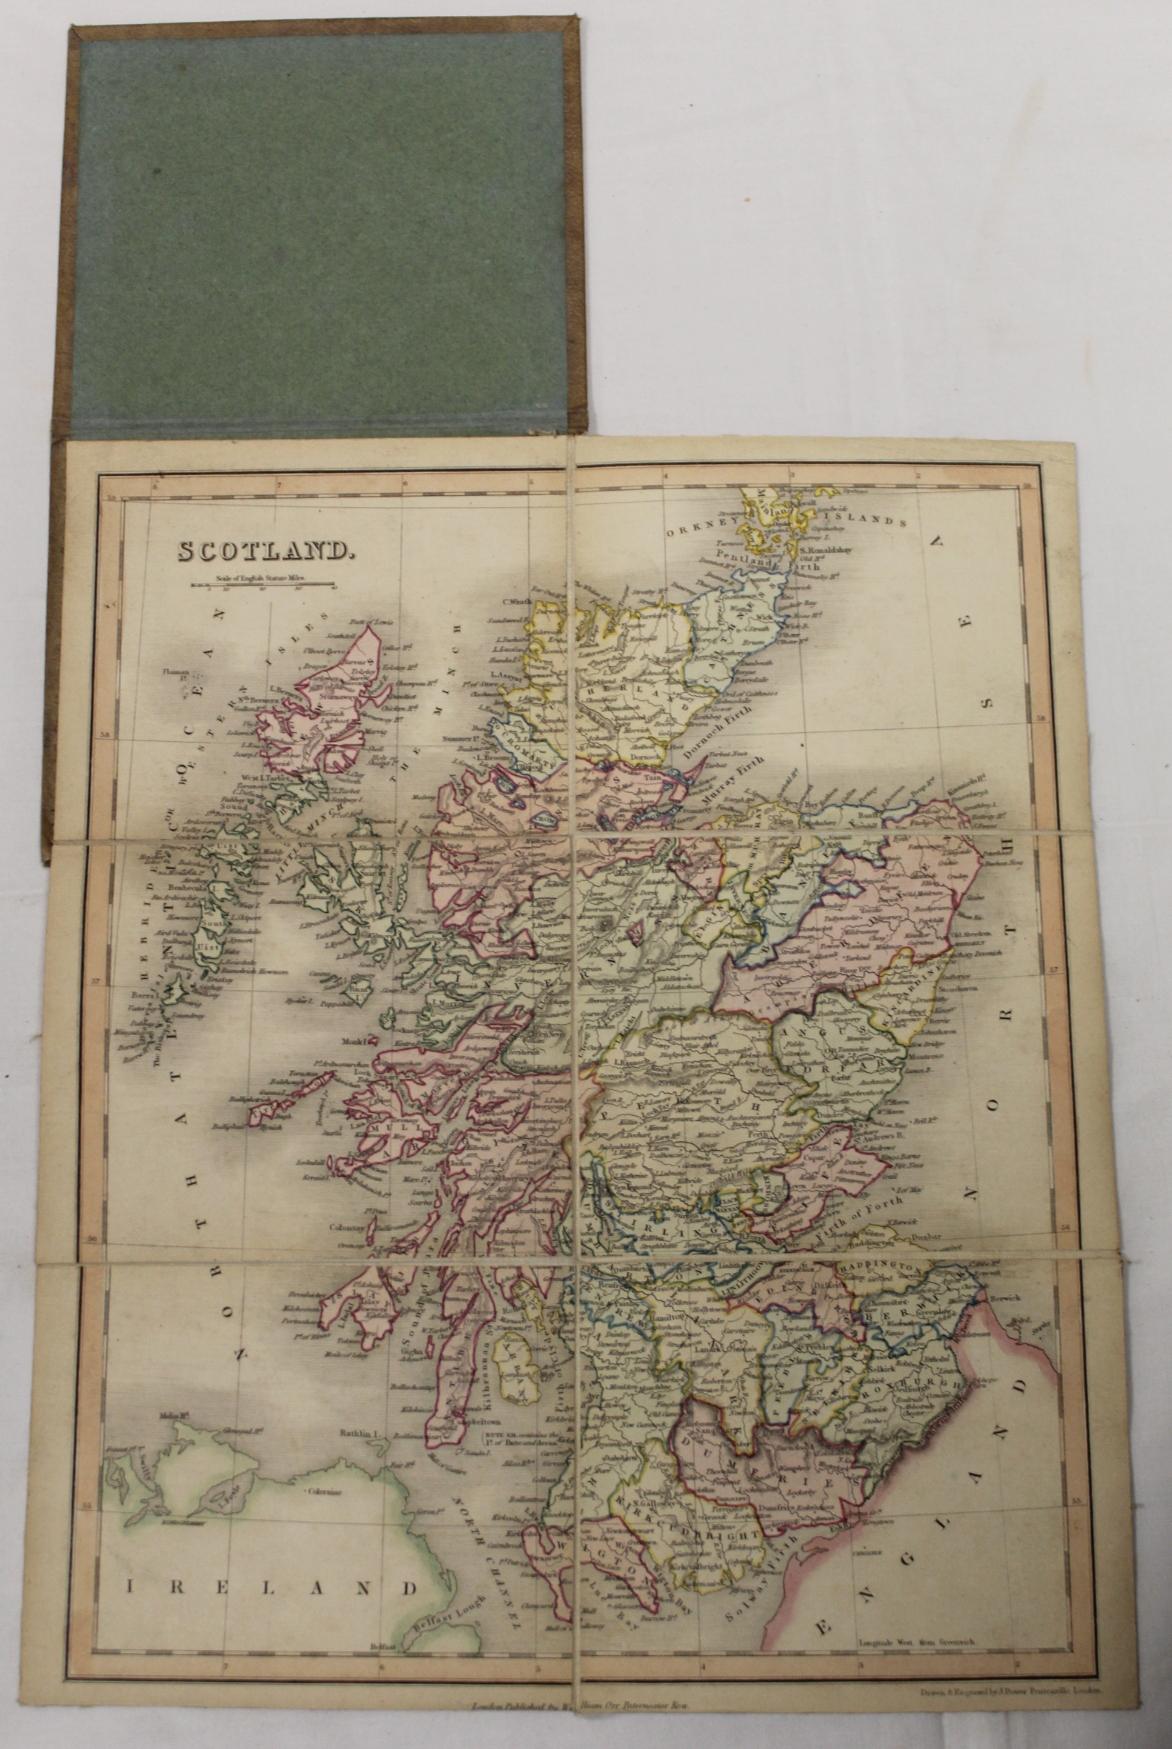 KIRKWOOD J. & SONS.Map of Scotland. Hand col. eng. fldg. linen map in well worn orig. slip case. - Image 19 of 36